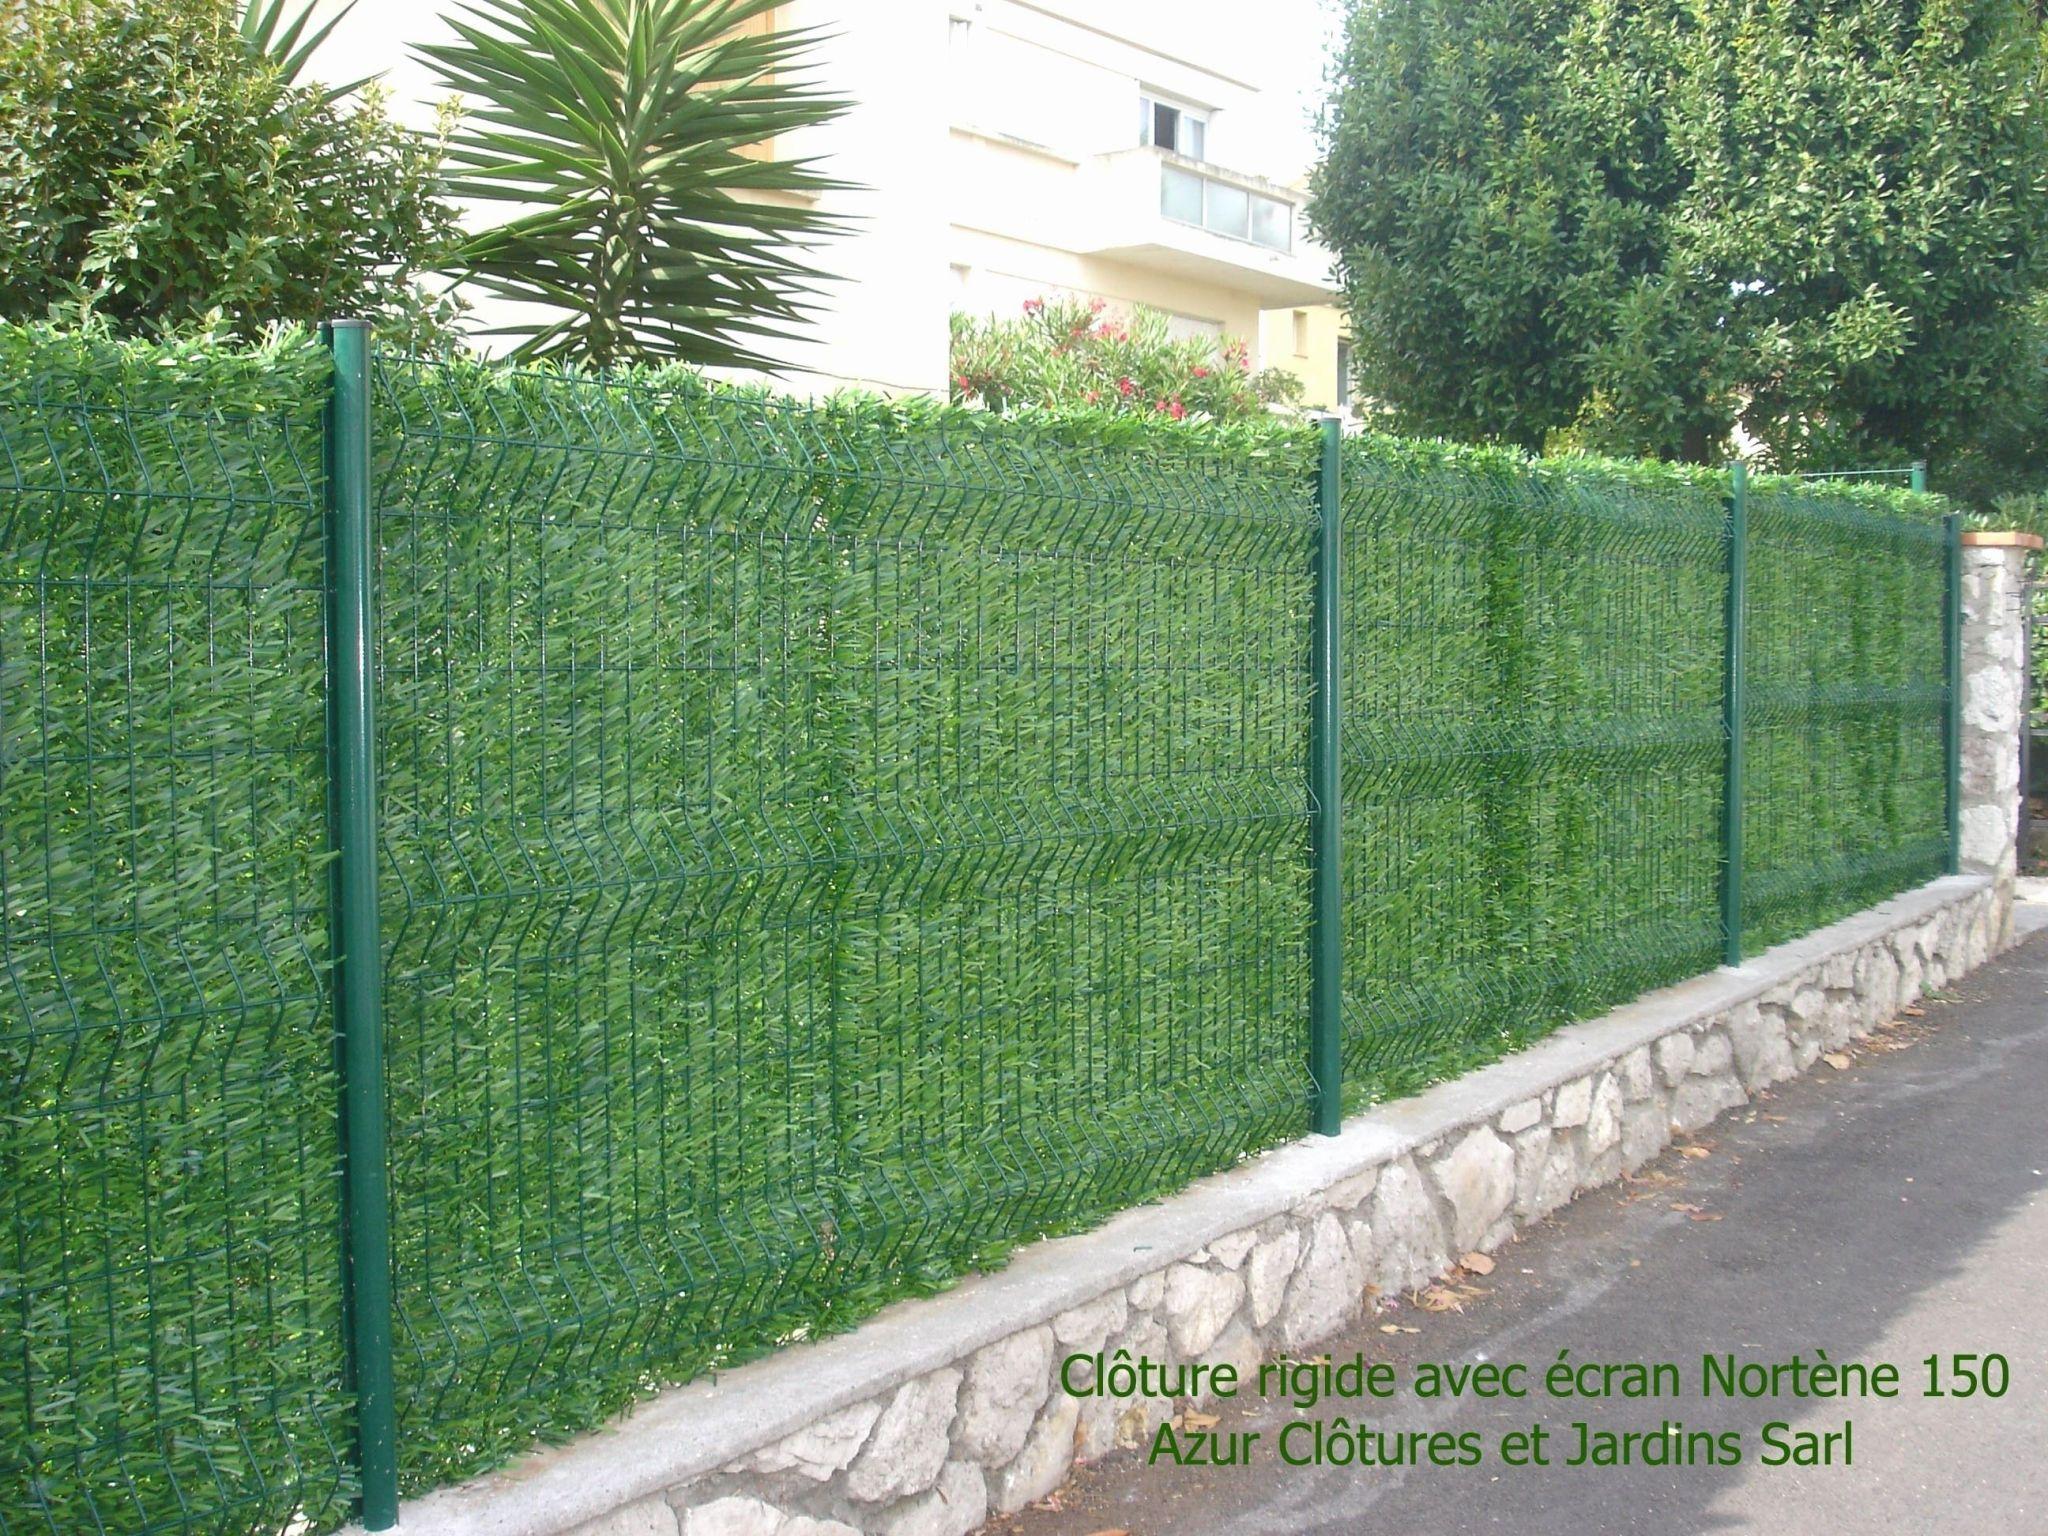 Pin By Alcira Campos On Outdoor Living In 2020 | Modern ... intérieur Serre De Jardin Jardiland